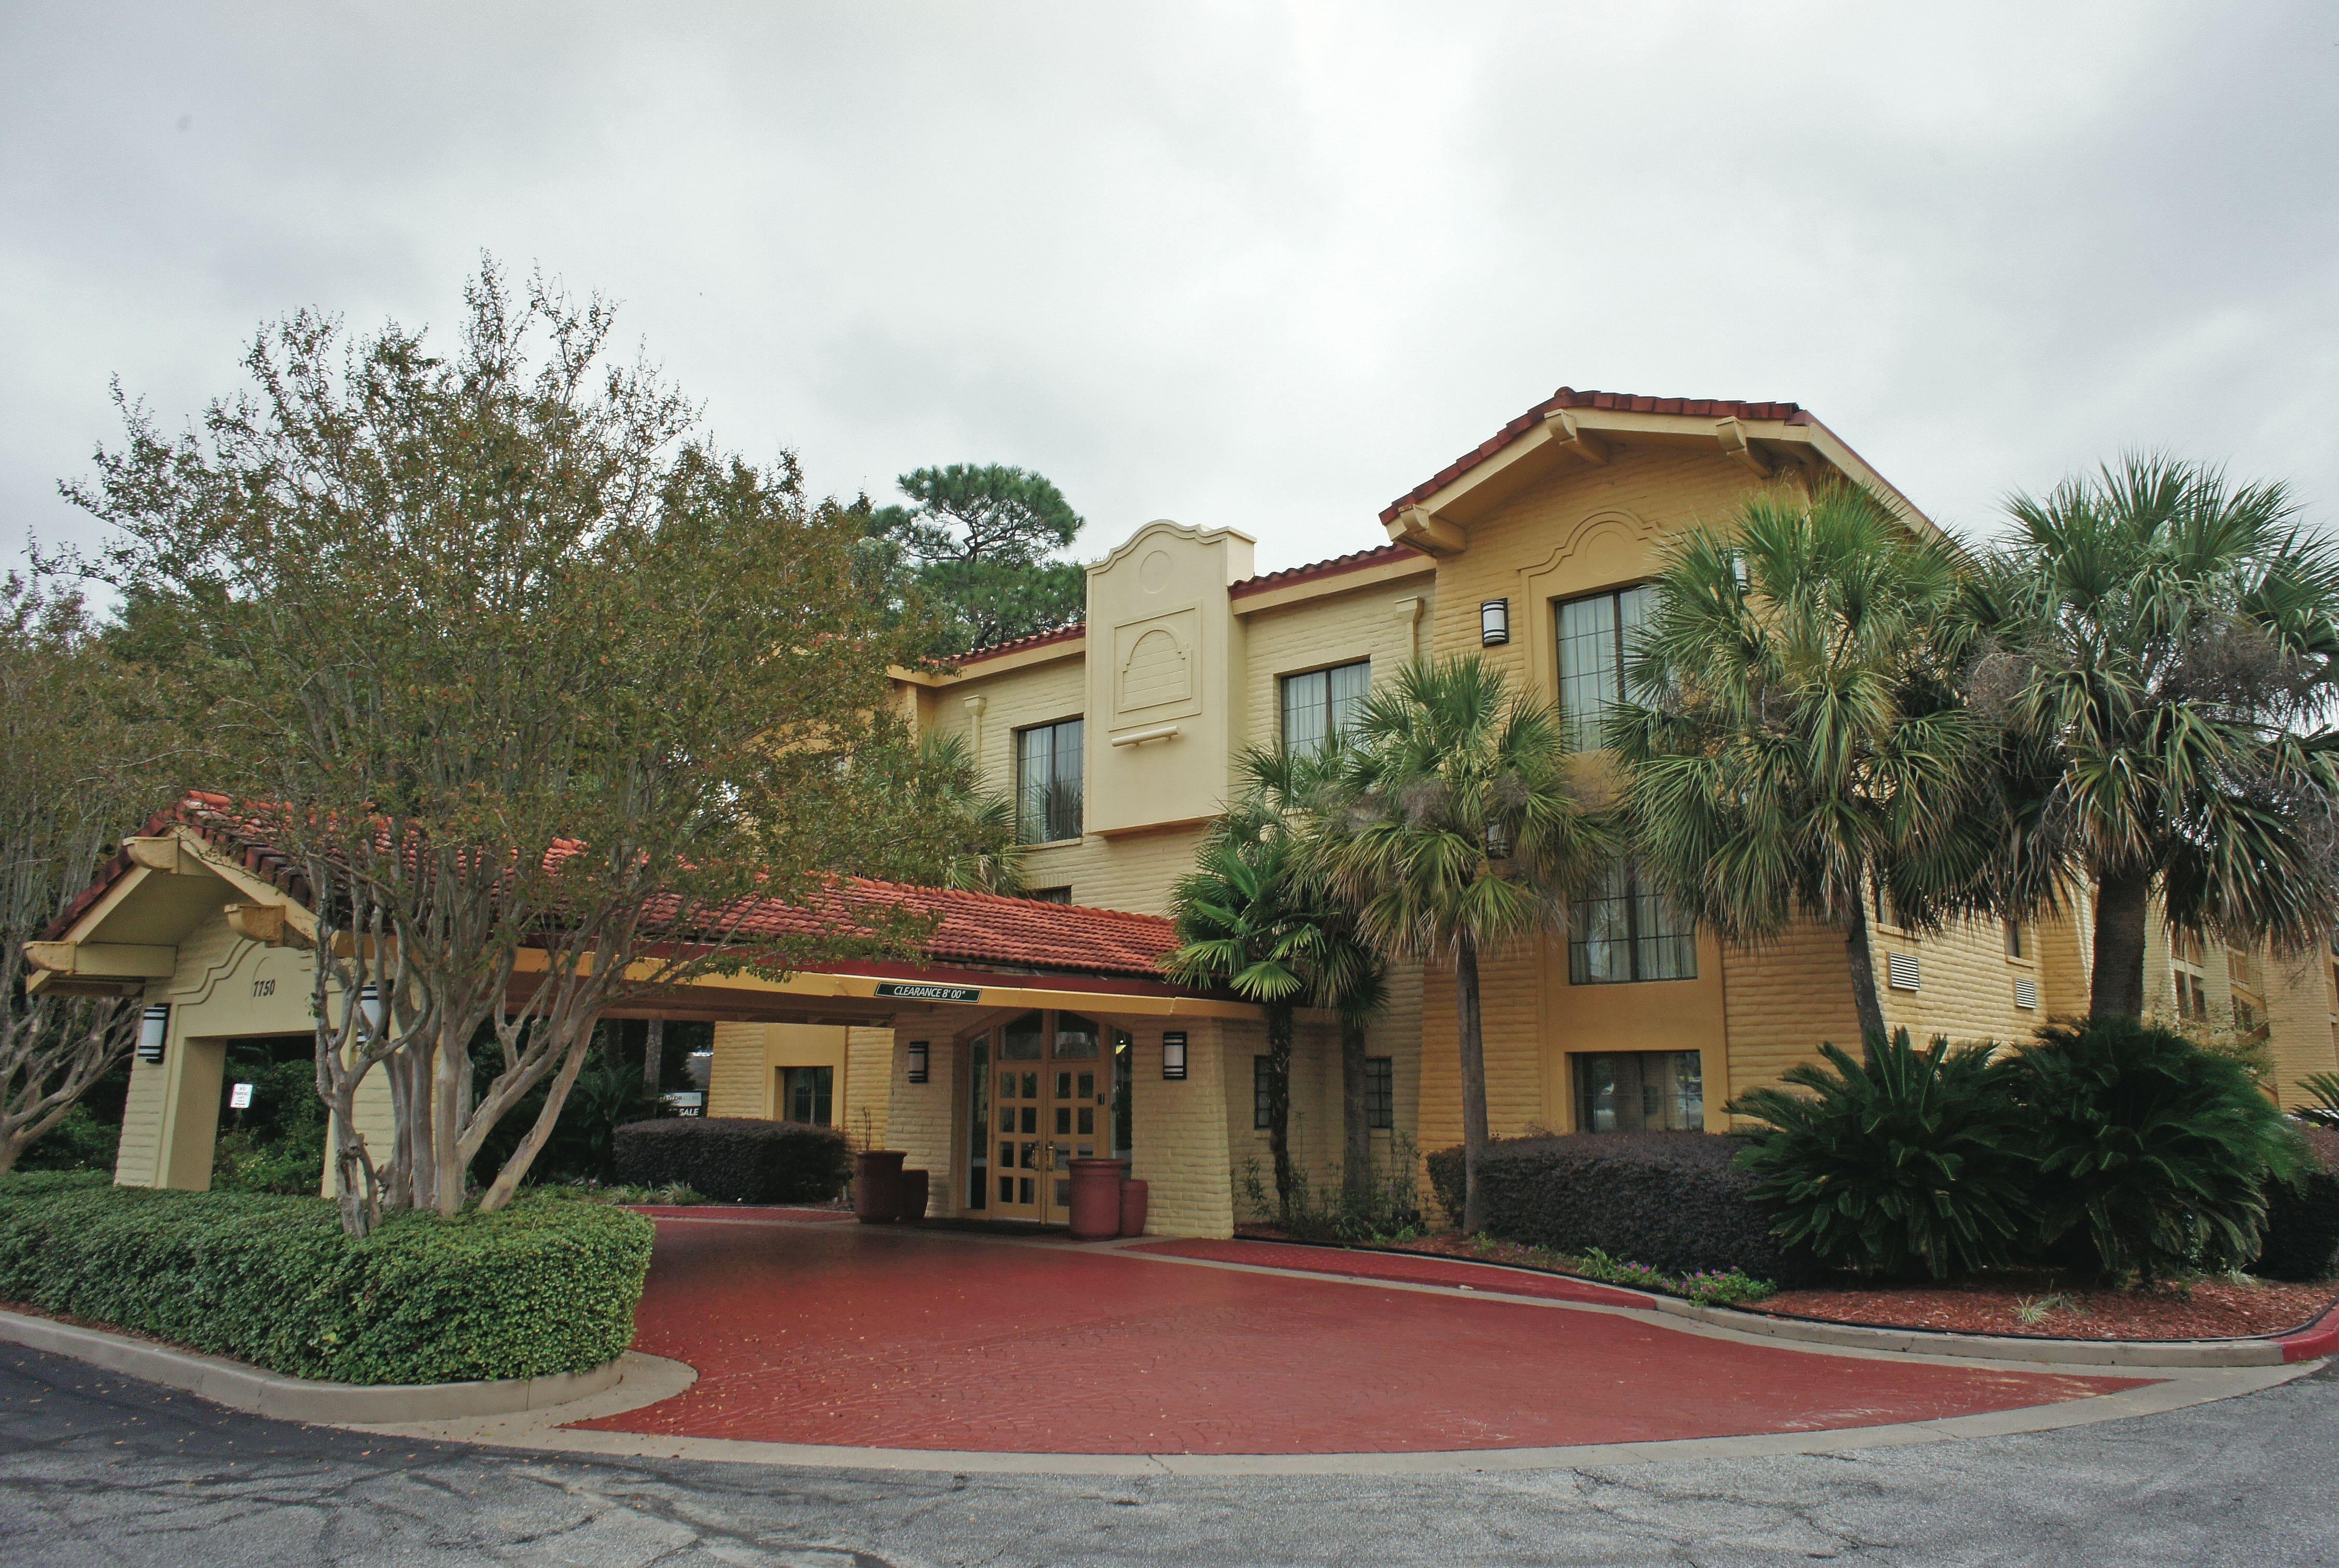 La Quinta Inn by Wyndham Pensacola | Pensacola, FL Hotels